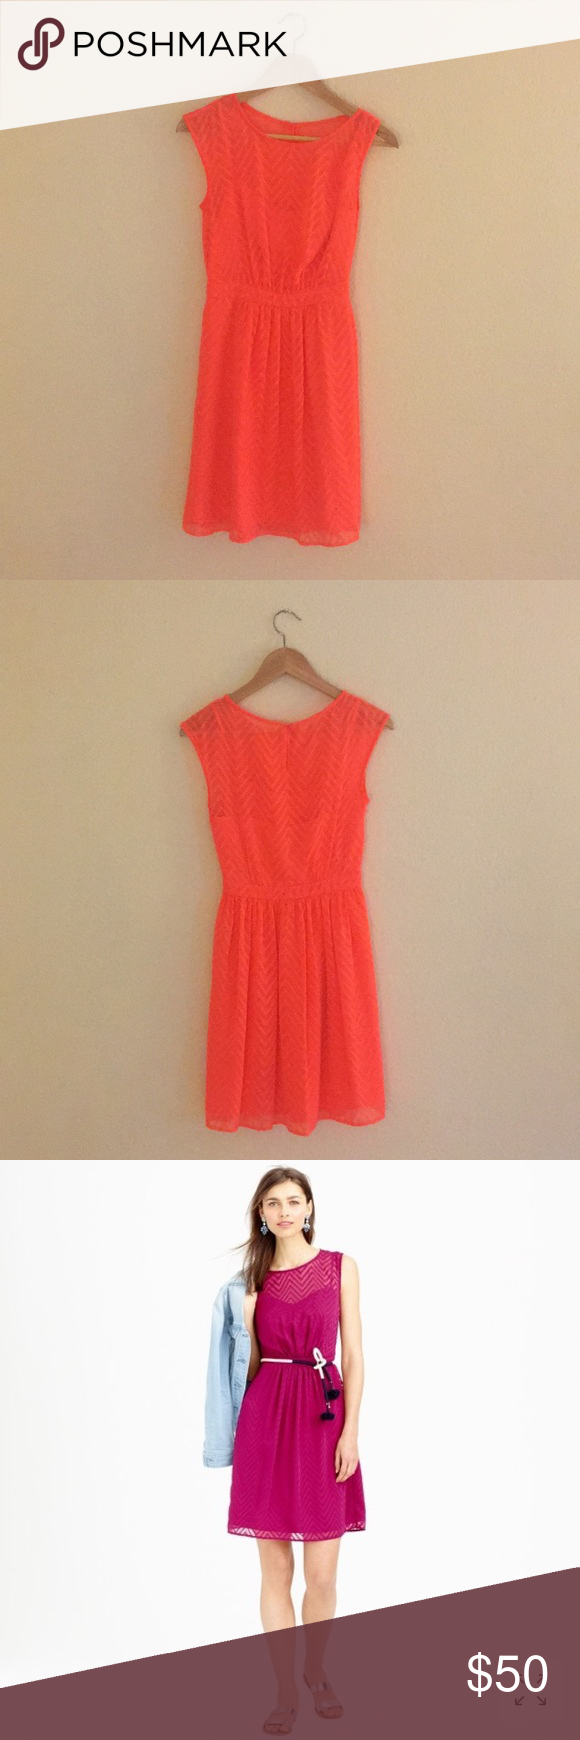 d0f9795b2a33e J Crew Sleeveless chiffon dress in zigzag Size 00 PRODUCT DETAILS A  feminine dress in light